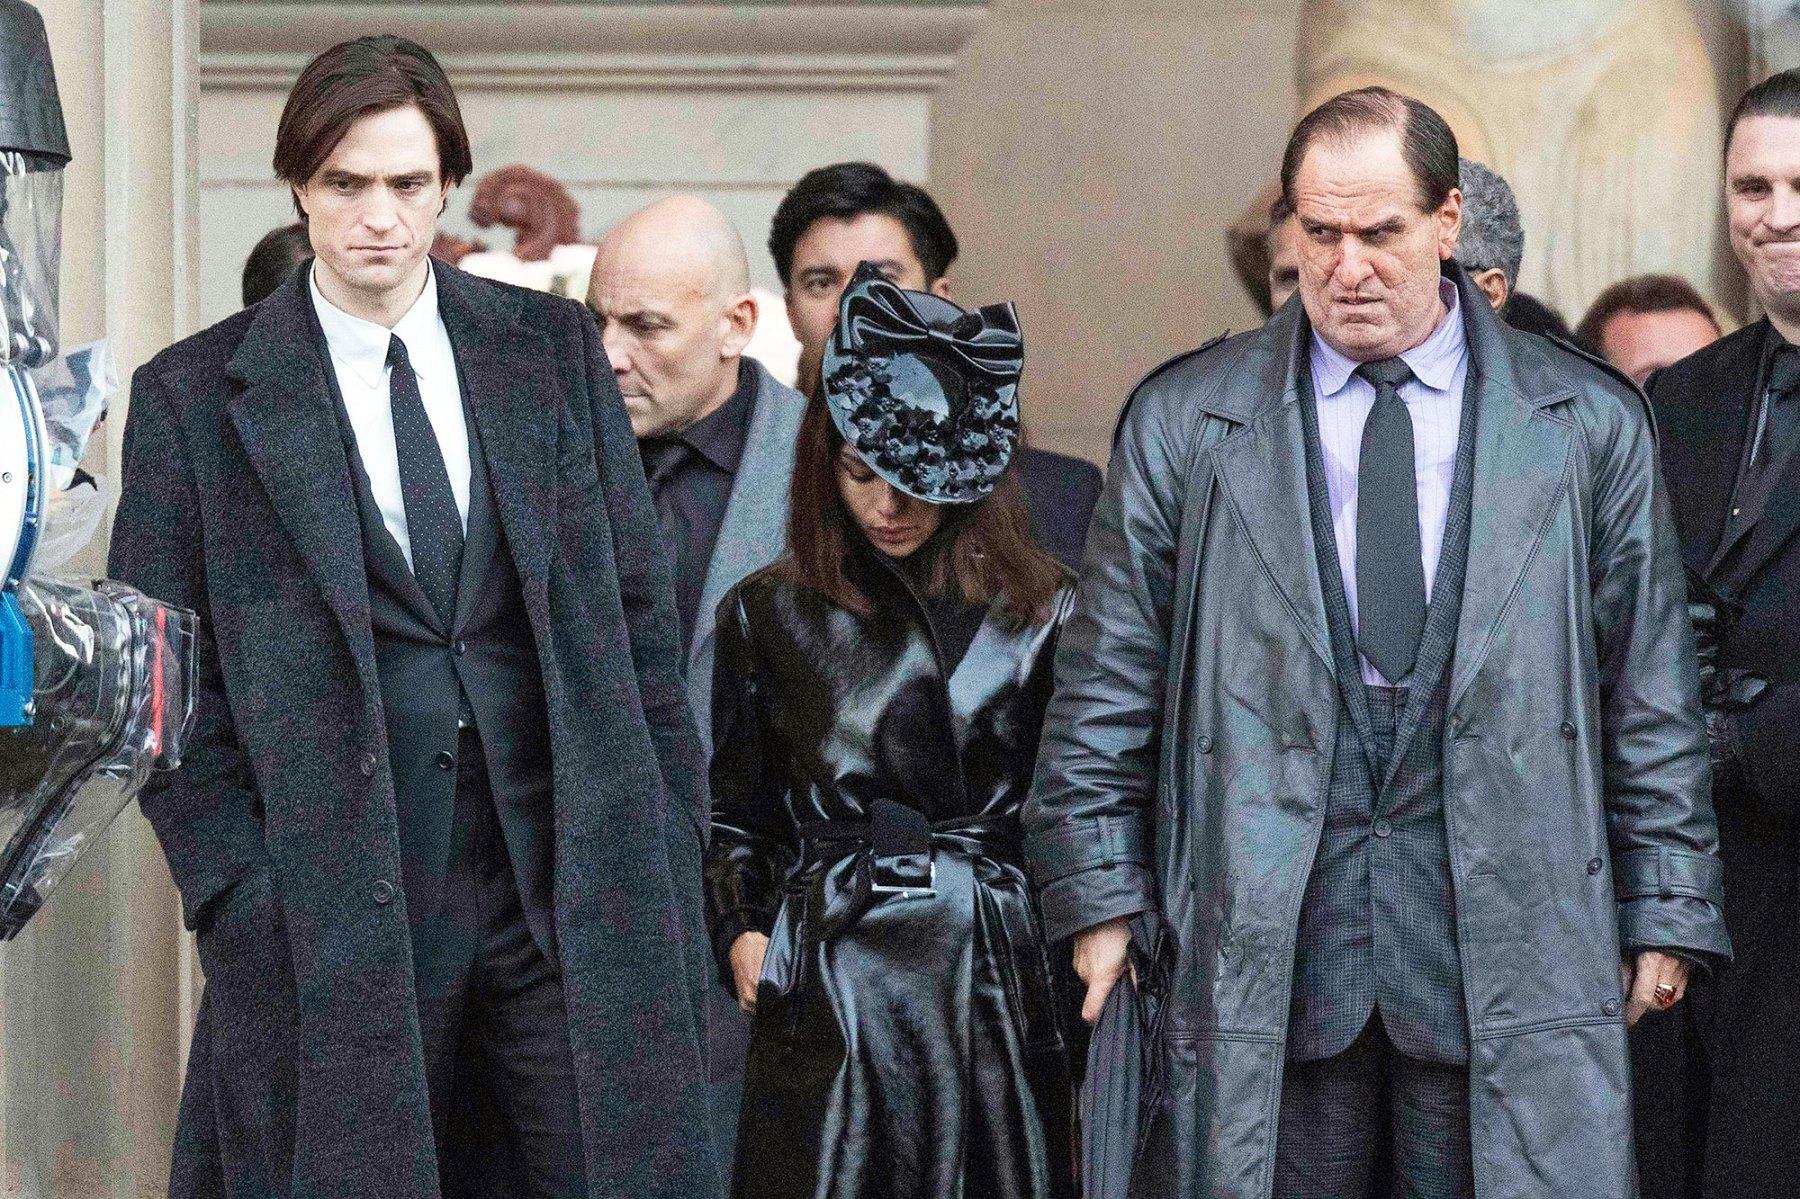 'Batman' Update: Robert Pattinson, Zoe Kravitz Spotted On ...